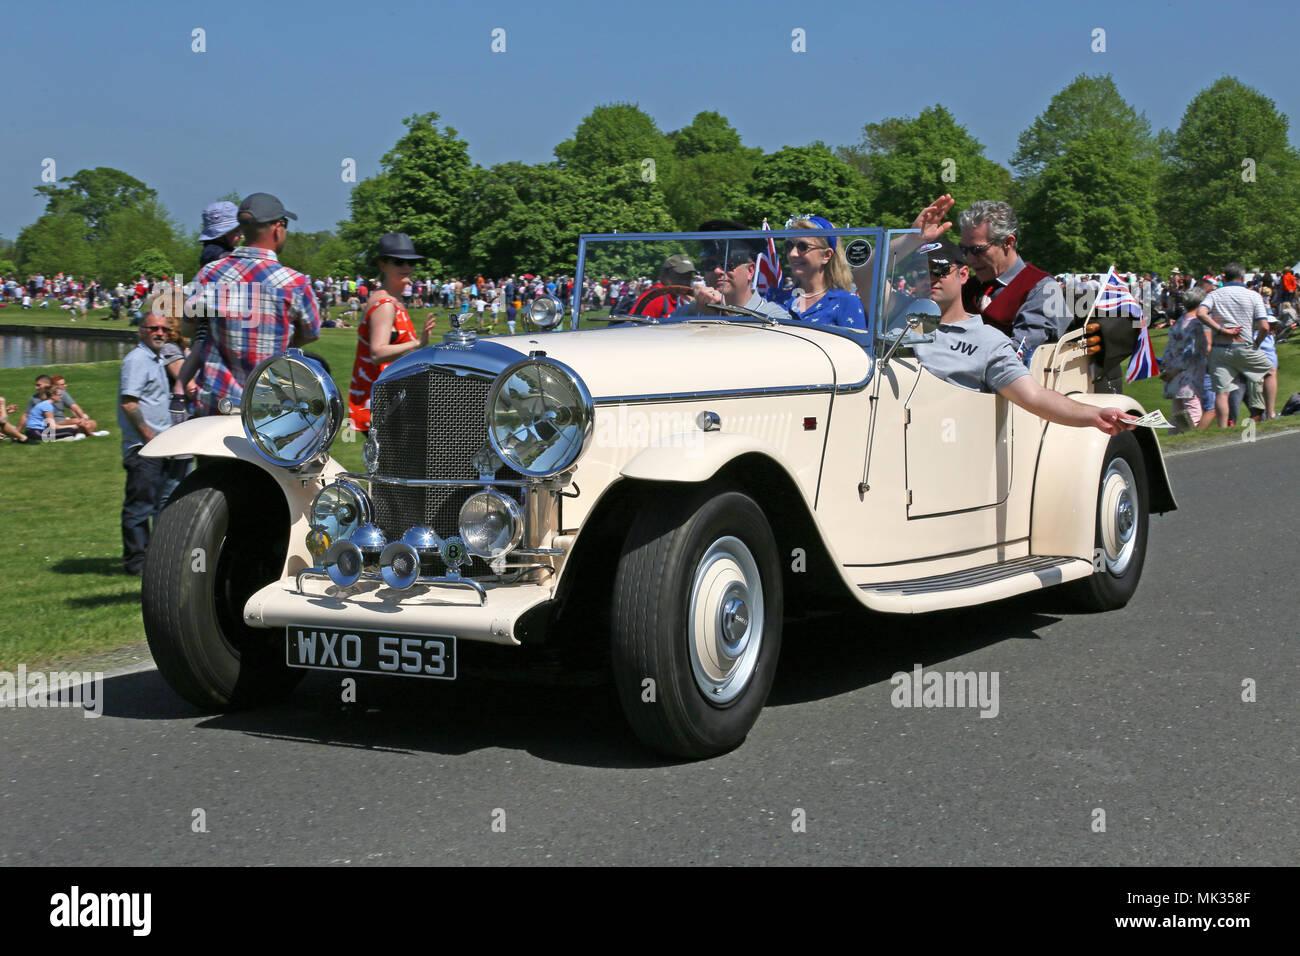 1947 bentley mkvi special roadster durch mallalieu chestnut sonntag 6 mai 2018